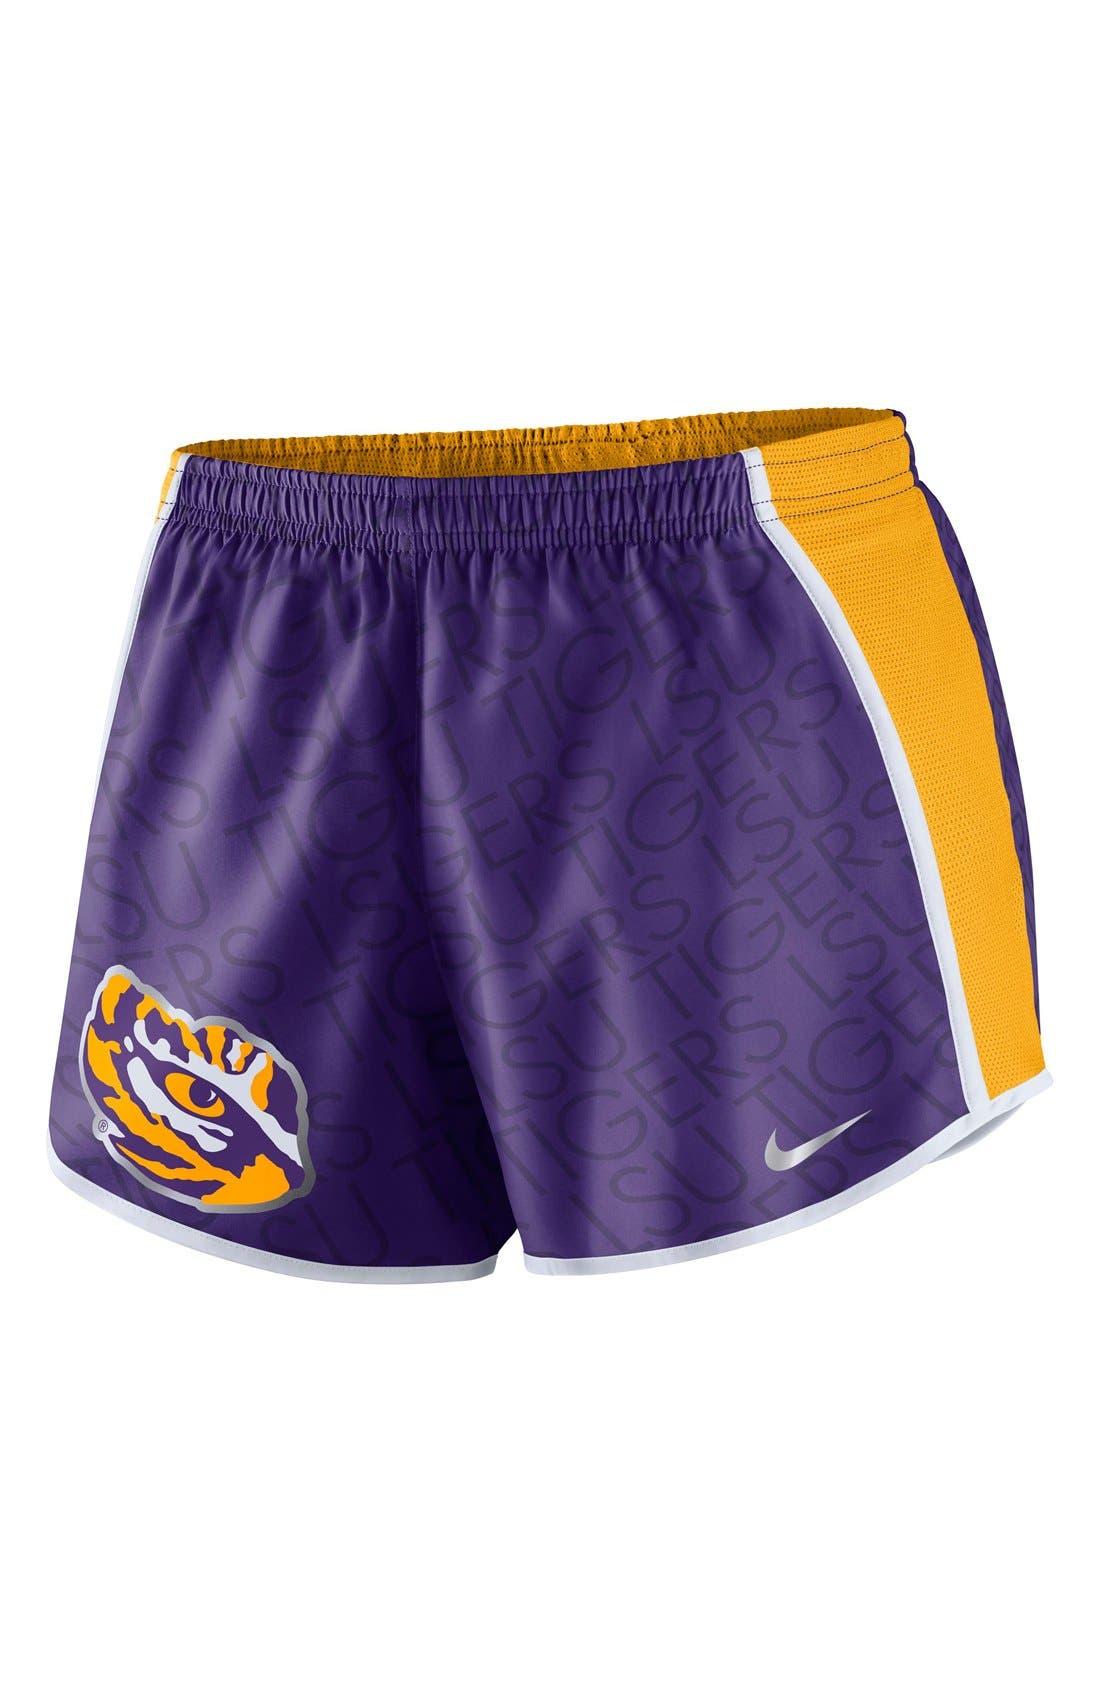 Alternate Image 1 Selected - Nike 'Champ Drive - Louisiana State University' Logo Dri-FIT Shorts